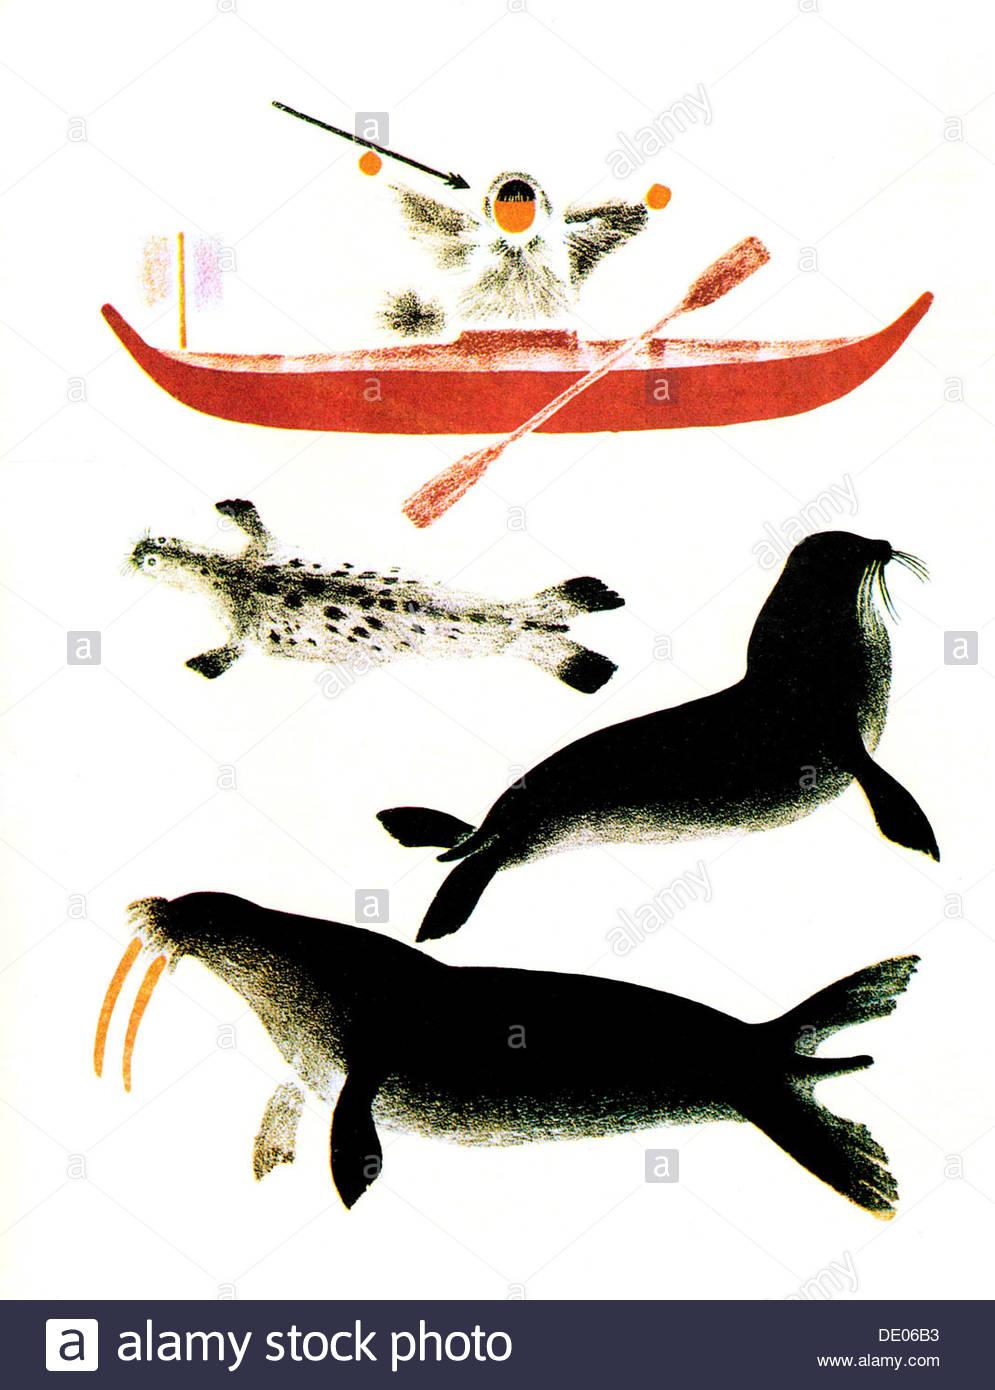 'The Pinniped Hunting', 1925.  Artist: Vladimir Lebedev - Stock Image